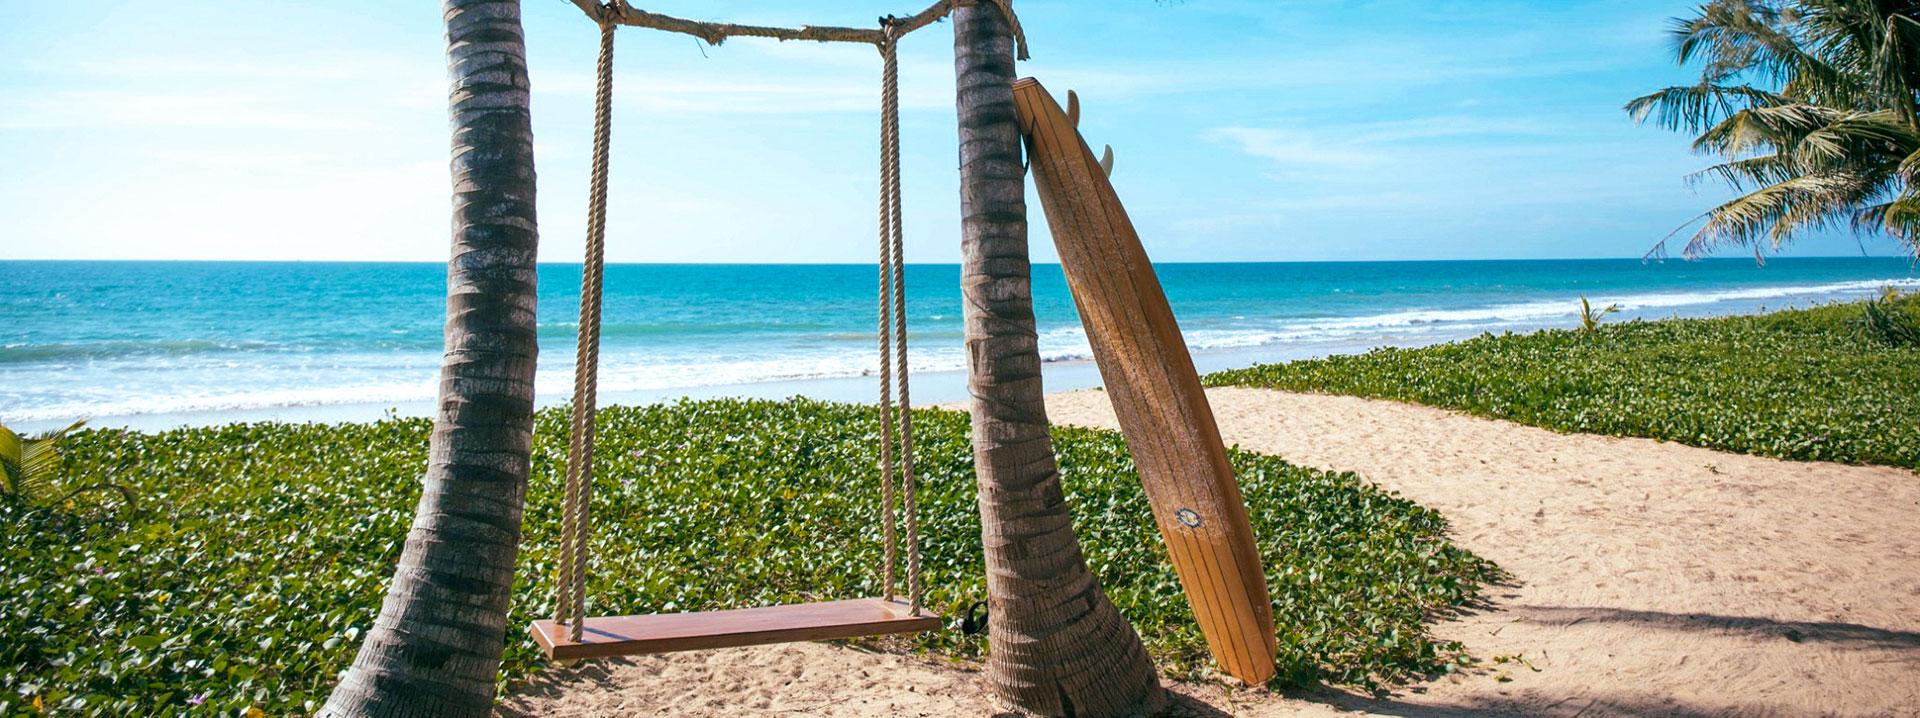 11-Facilities-Baba-Beach-Club-Luxury-Hotel-Phuket-by-Sri-Panwa